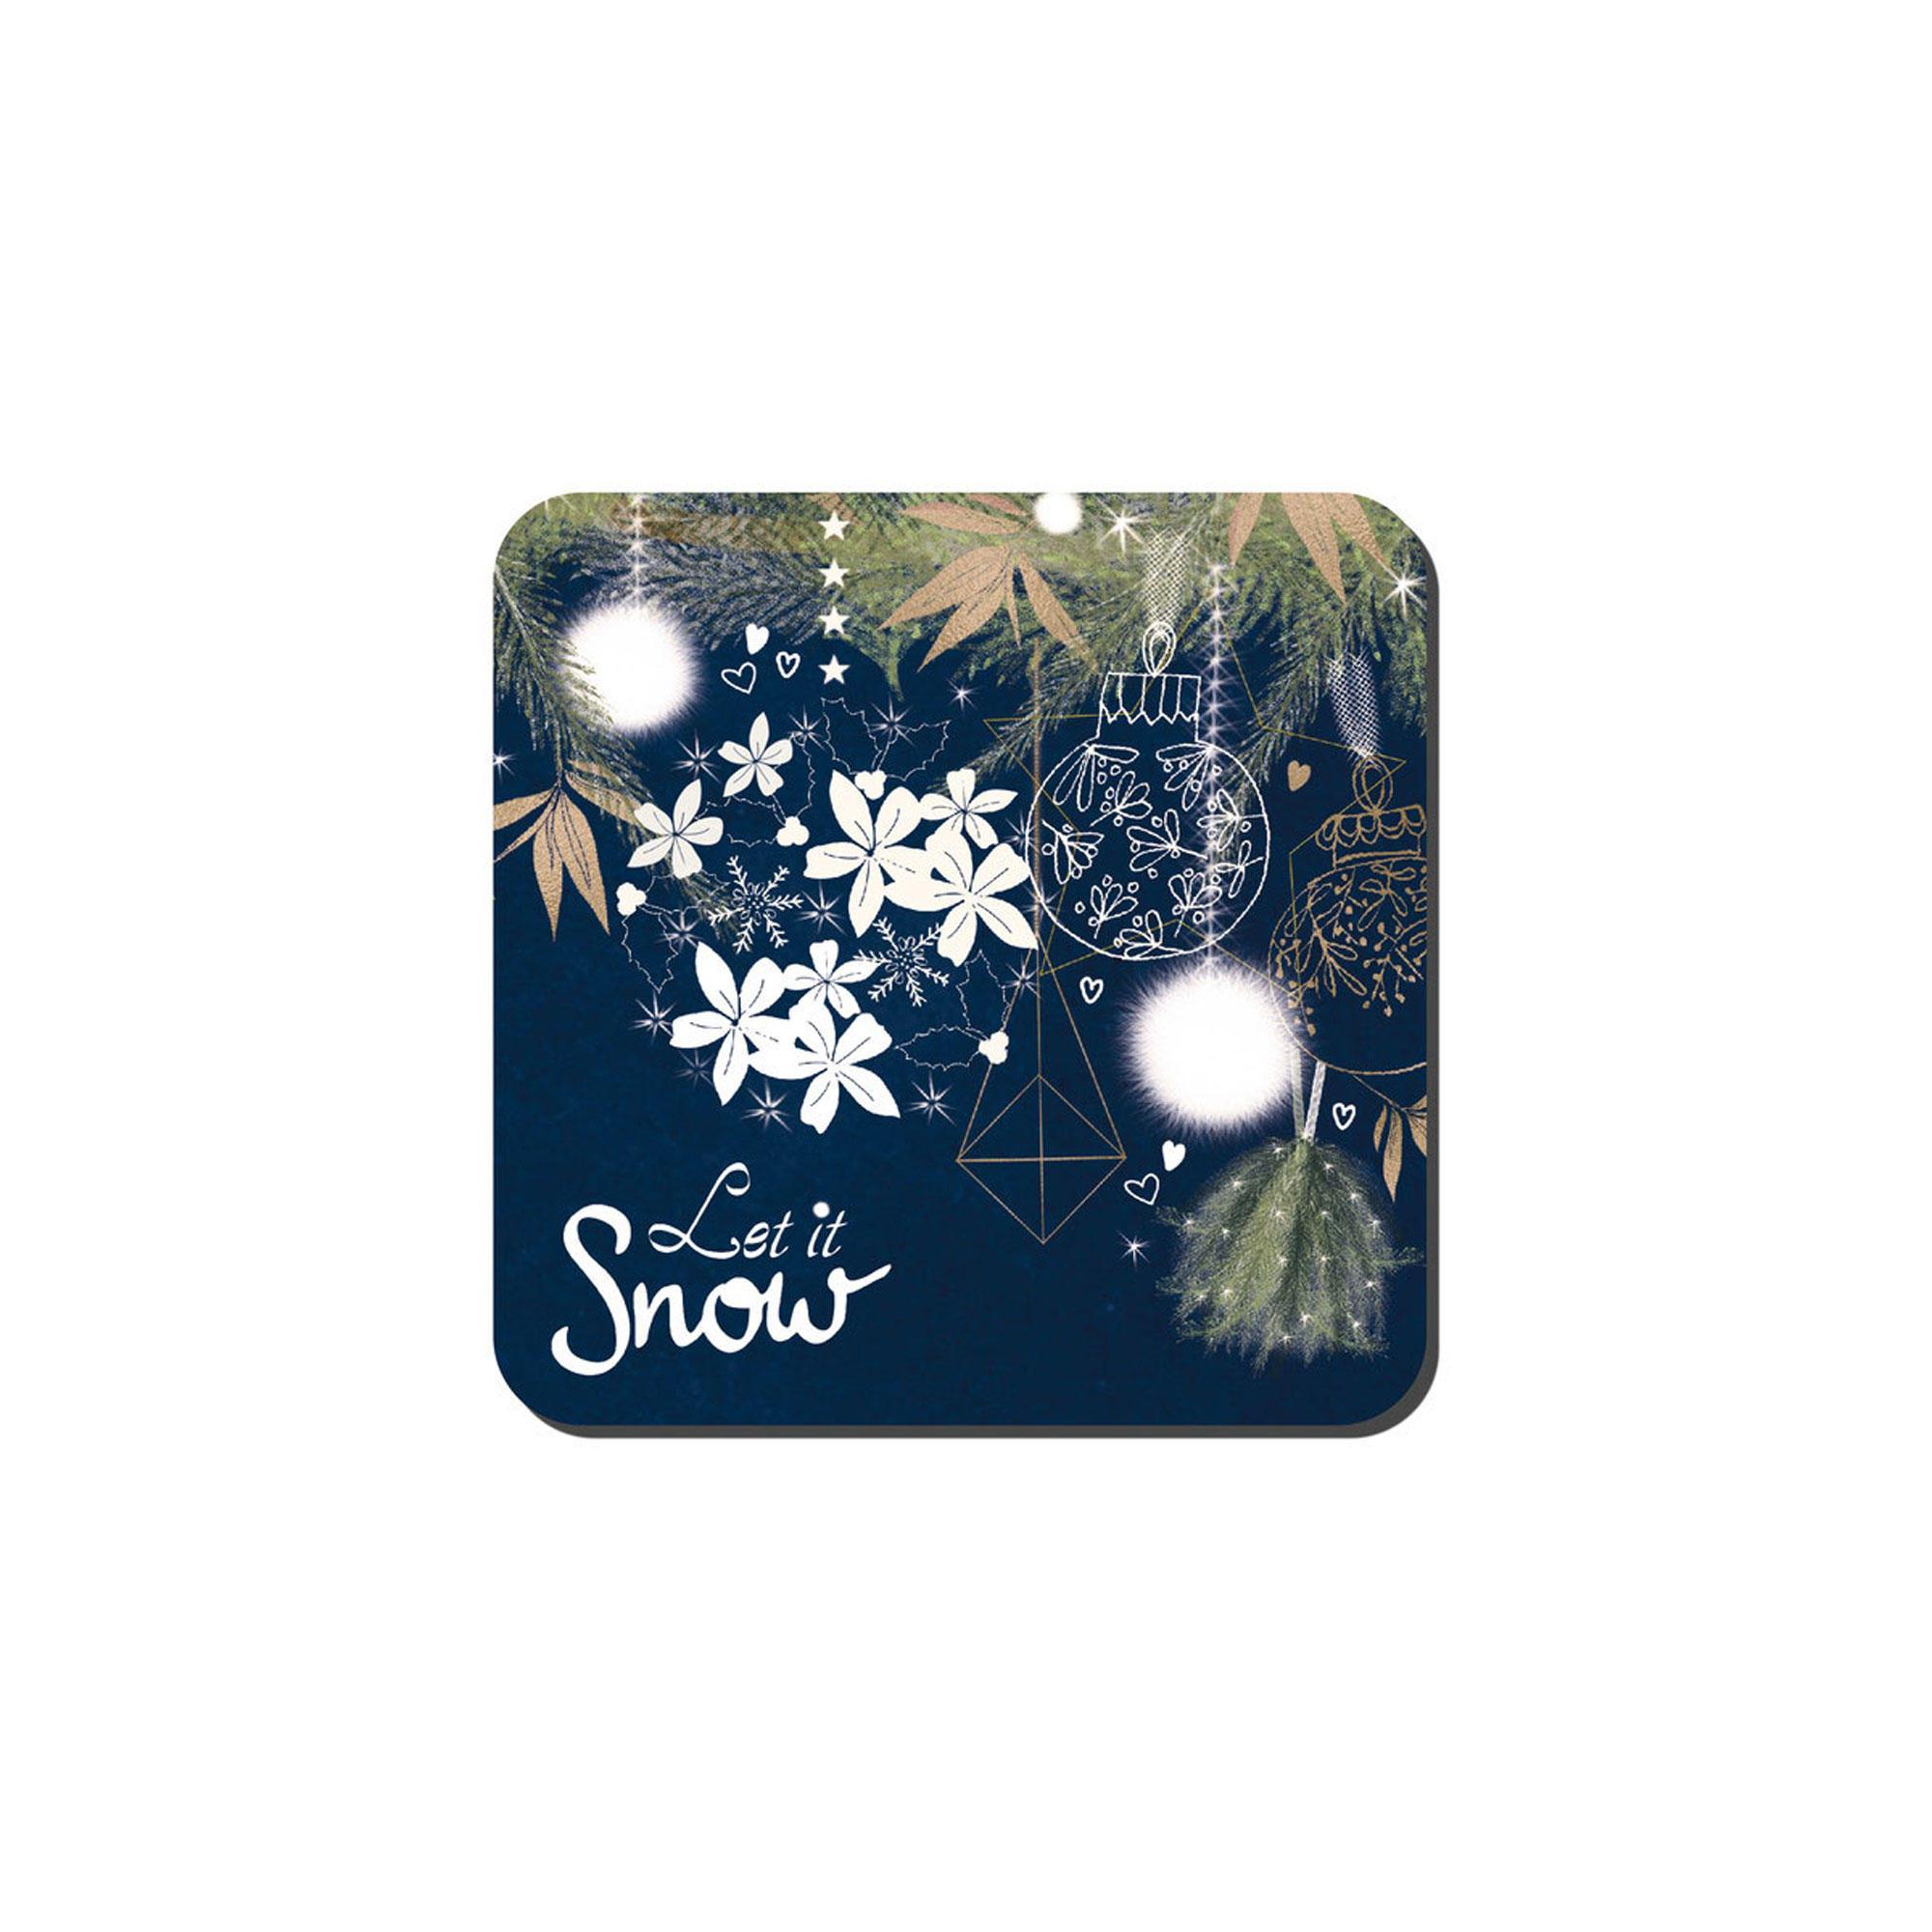 143636479: Let It Snow Set Of Six Coasters